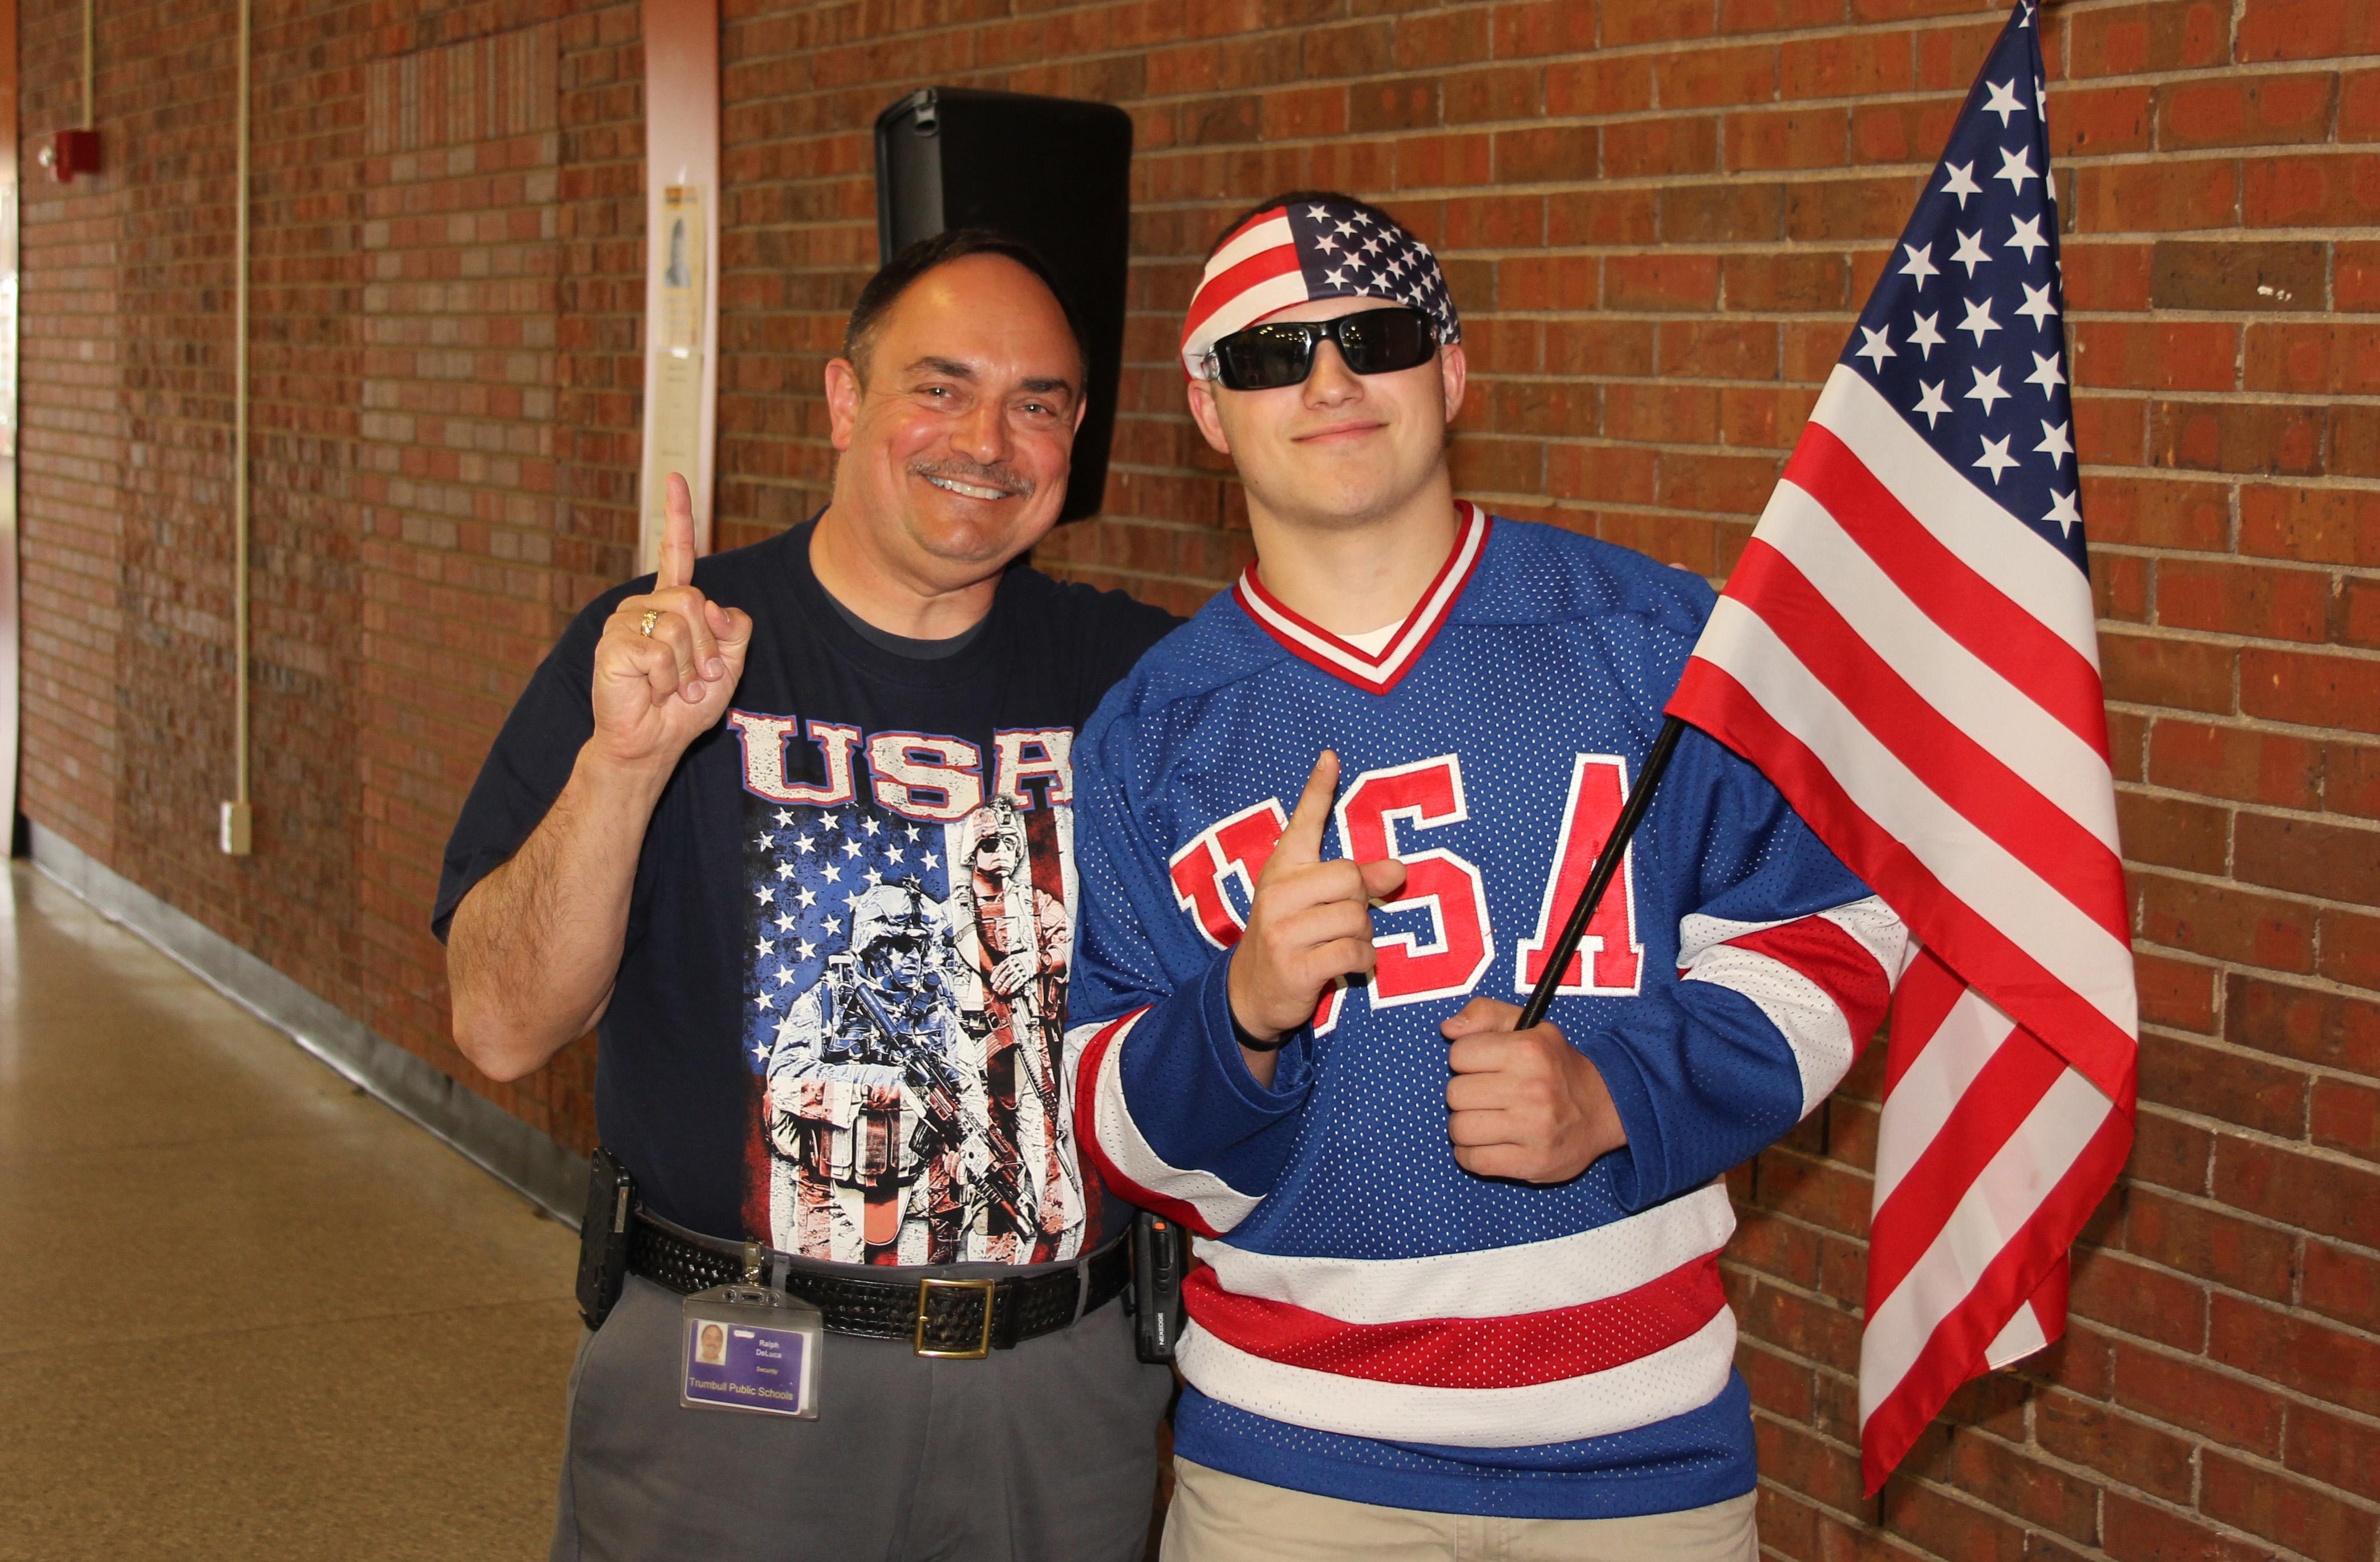 USA Day 04-25-16 008